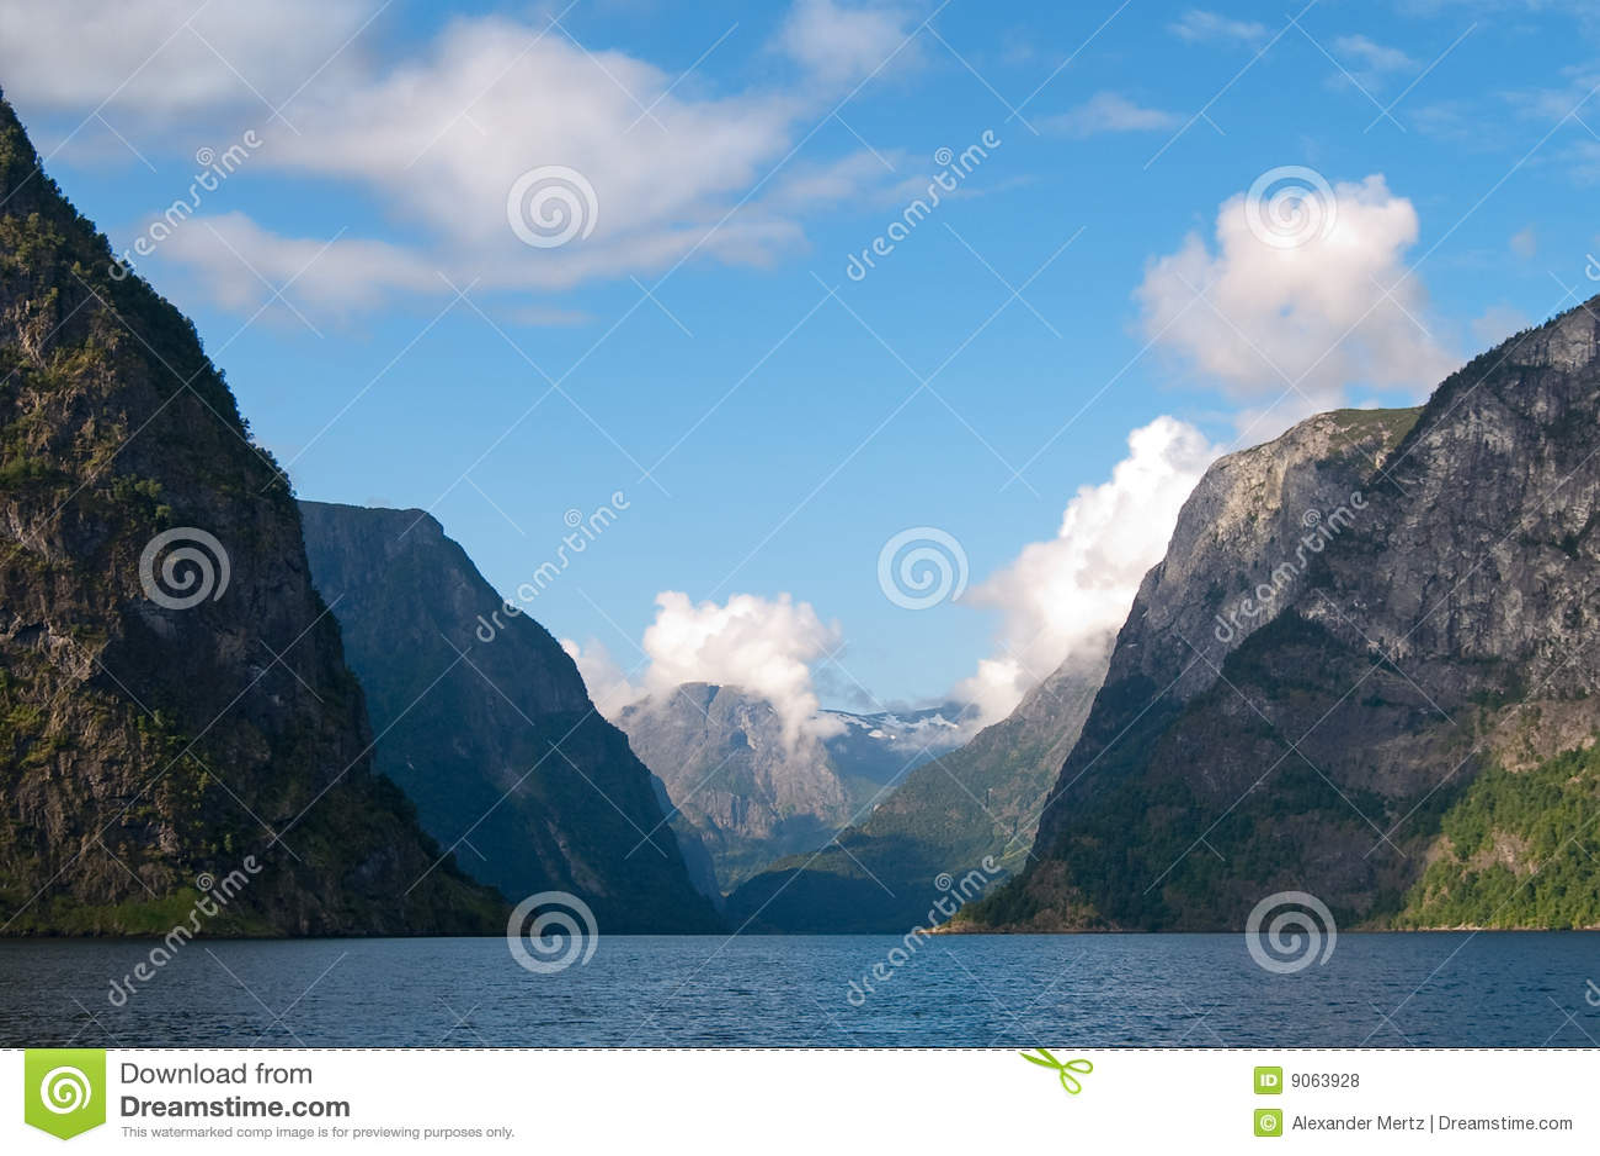 Naeroyfjord in Norvegia (patrimonio mondiale dell Unesco)